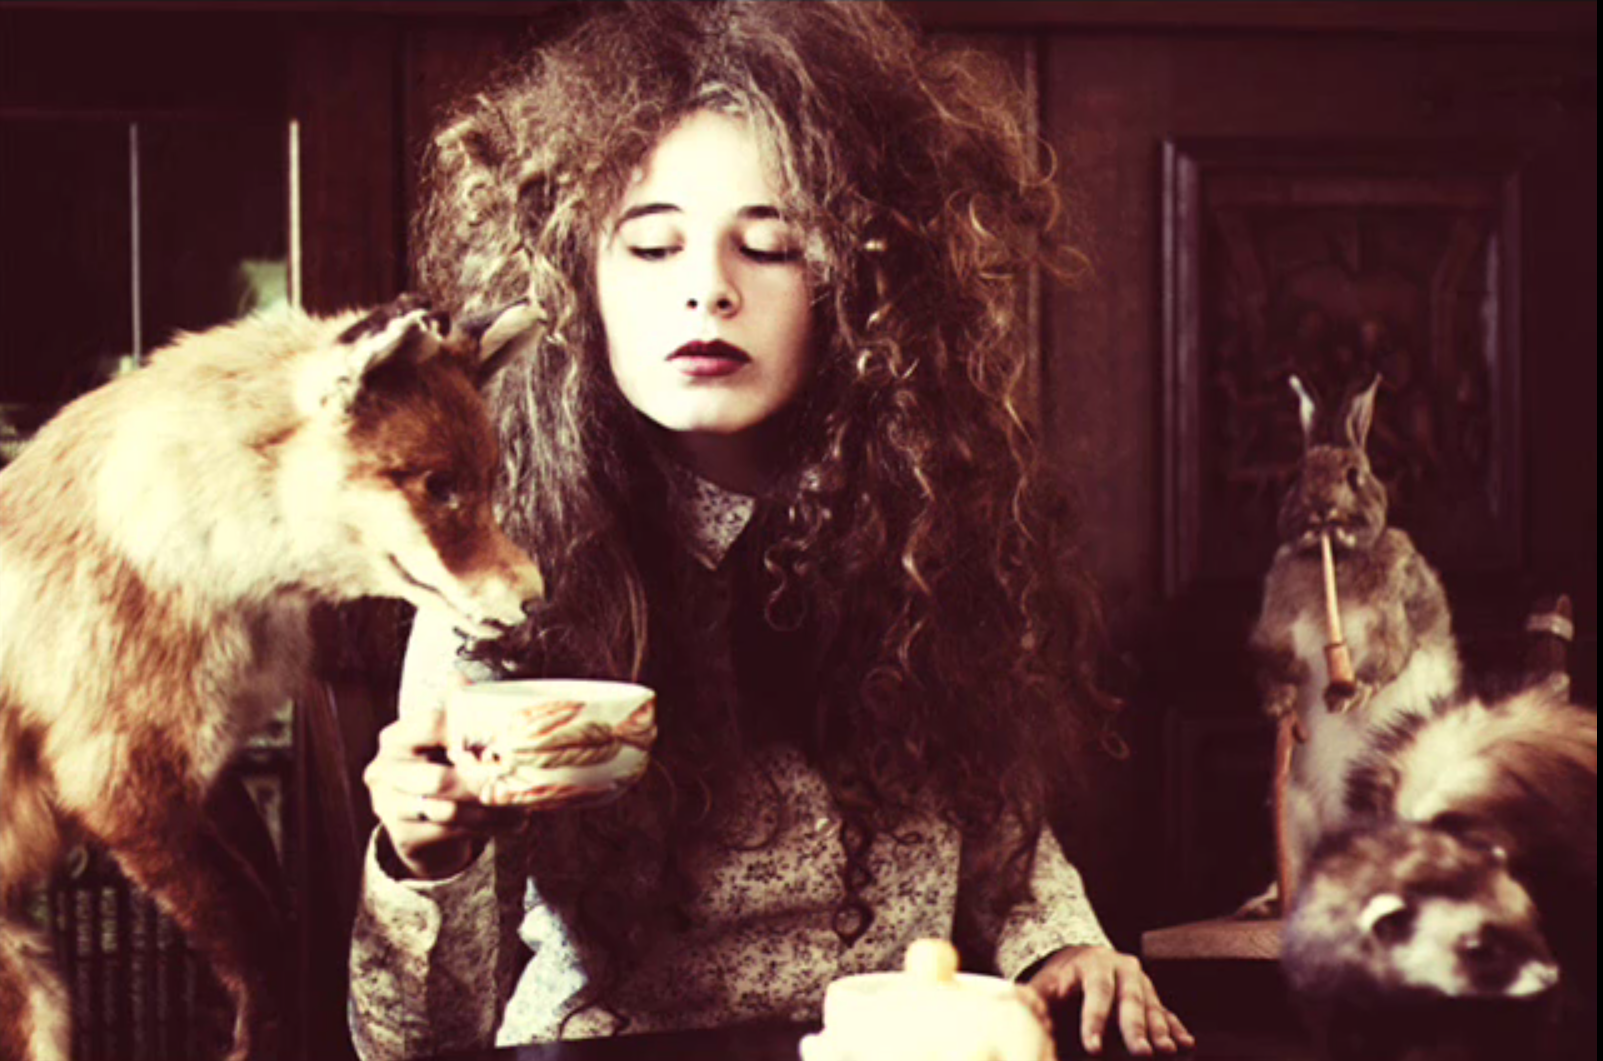 Artist/photographer-?   Tea with a fox and friends.